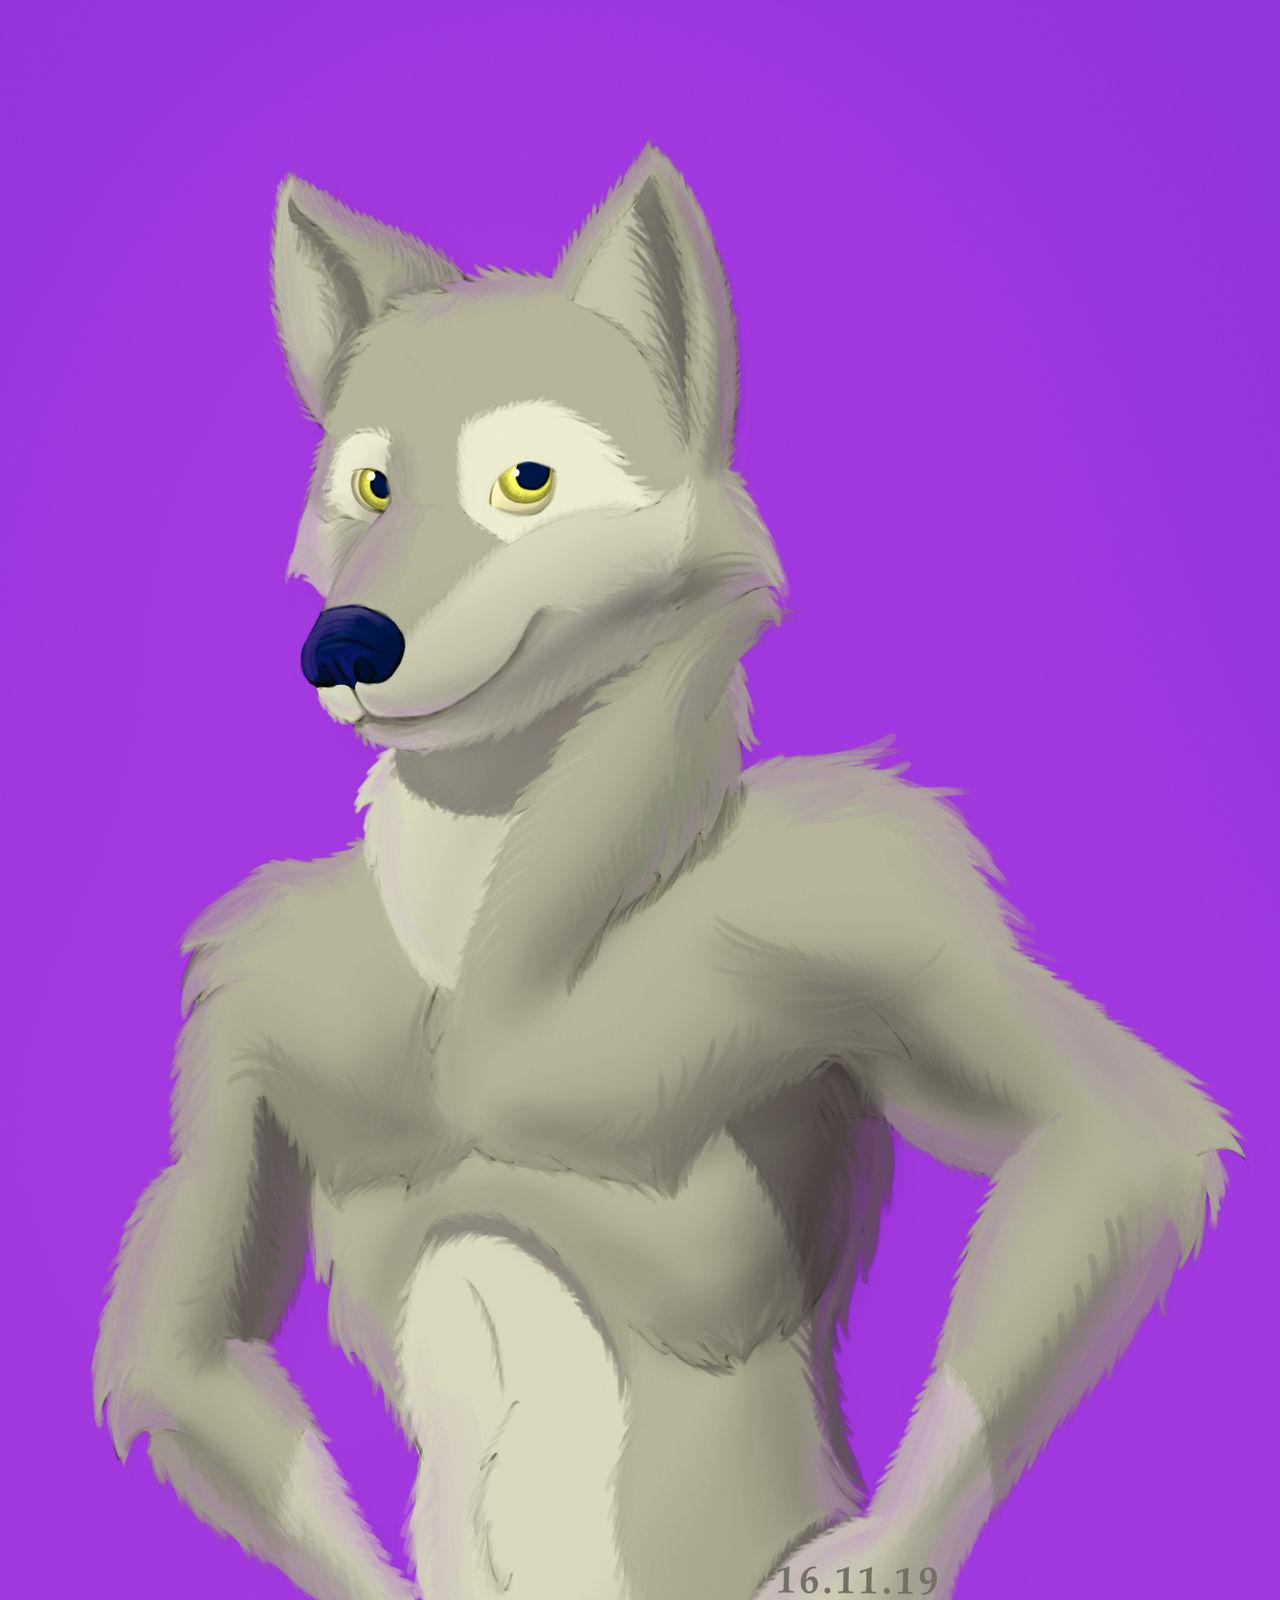 wolf_by_sapsanka_ddkqix4-fullview.jpg?to